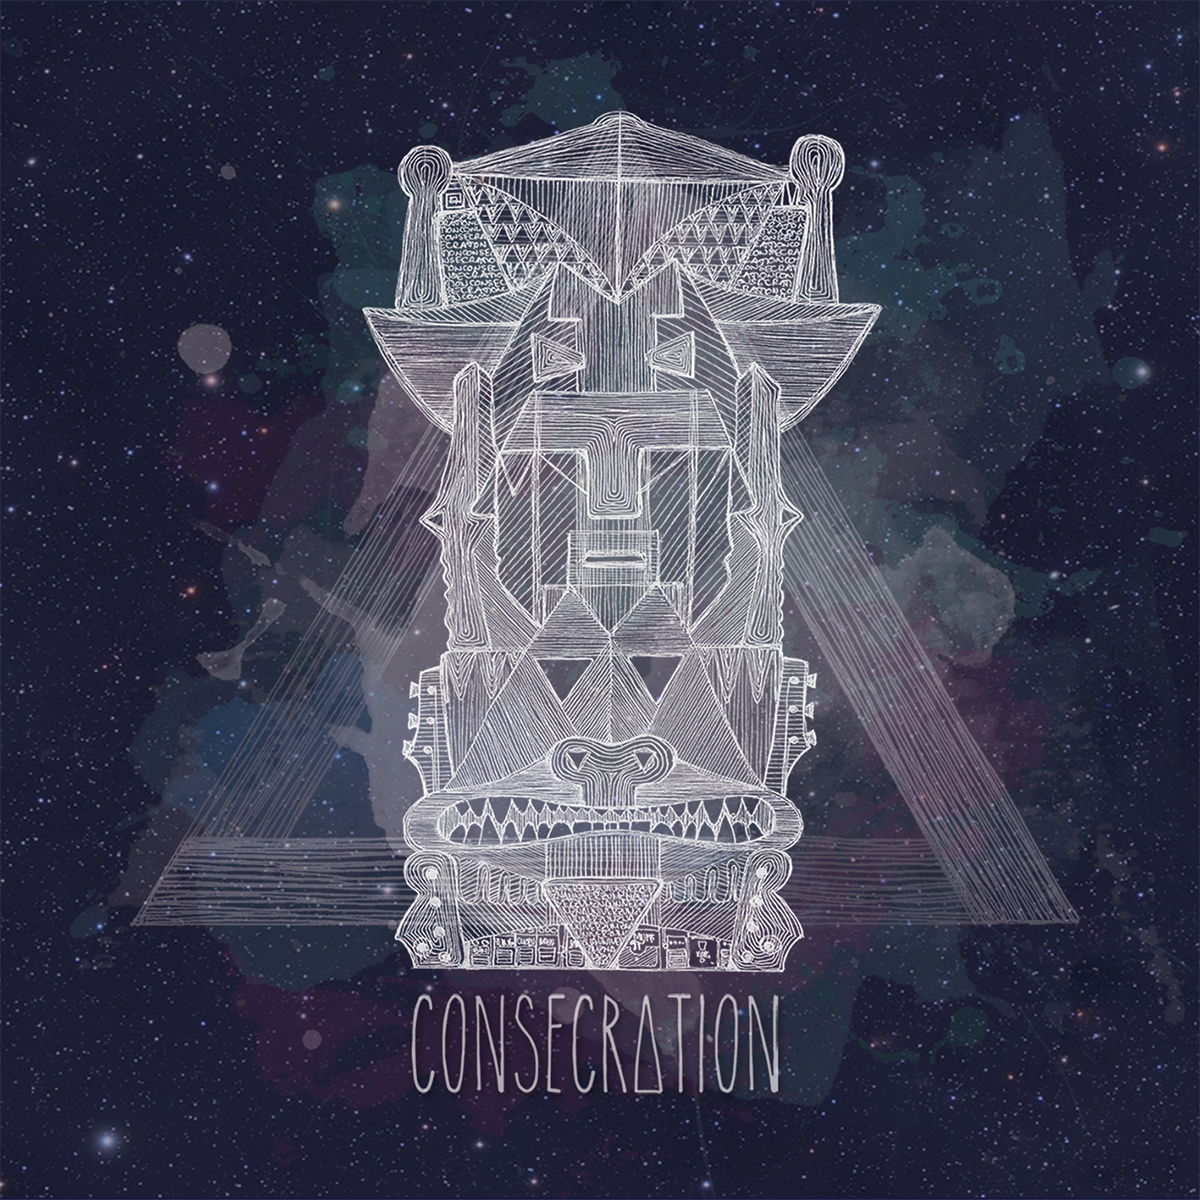 CONSECRATION - Univerzum zna